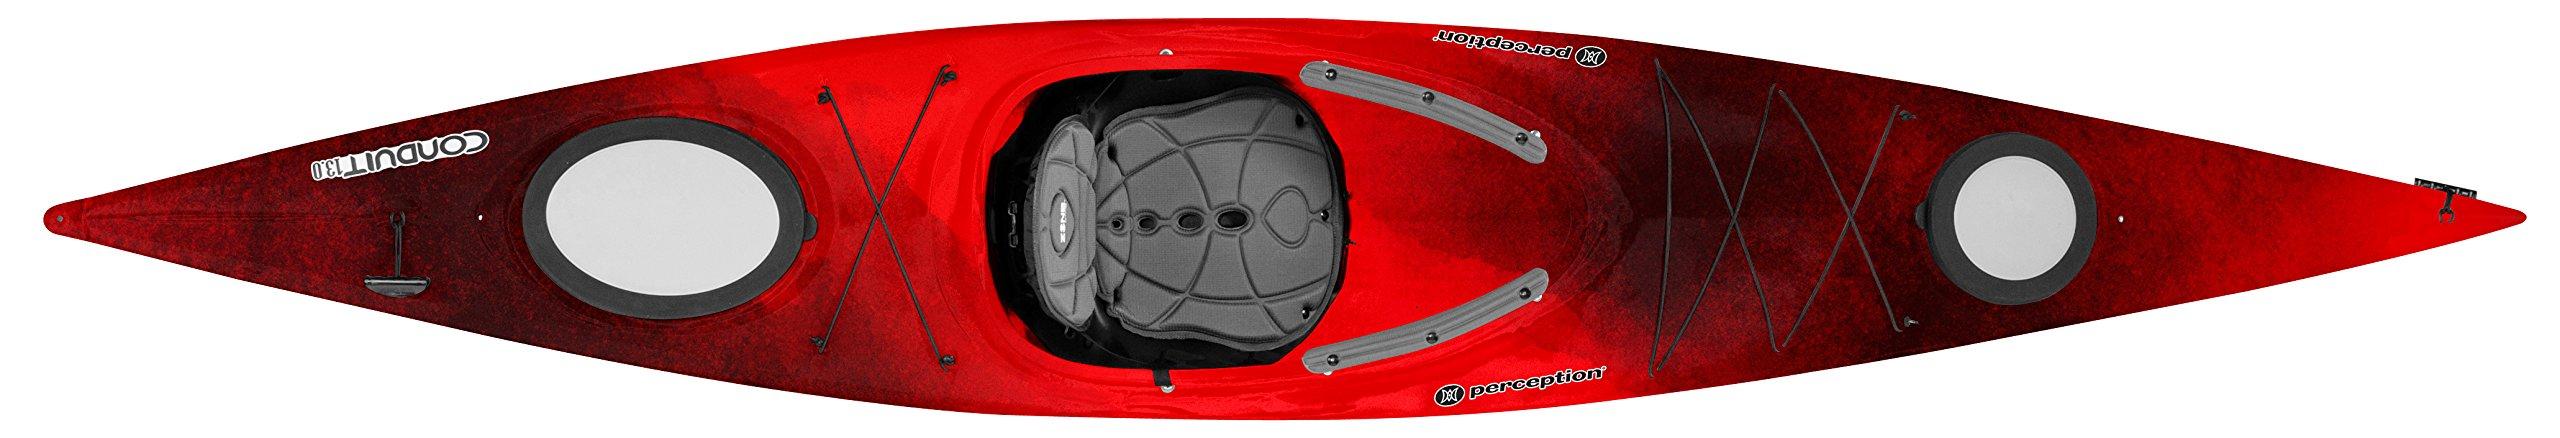 Perception Conduit Sit Inside Kayak for Recreation - 13.0